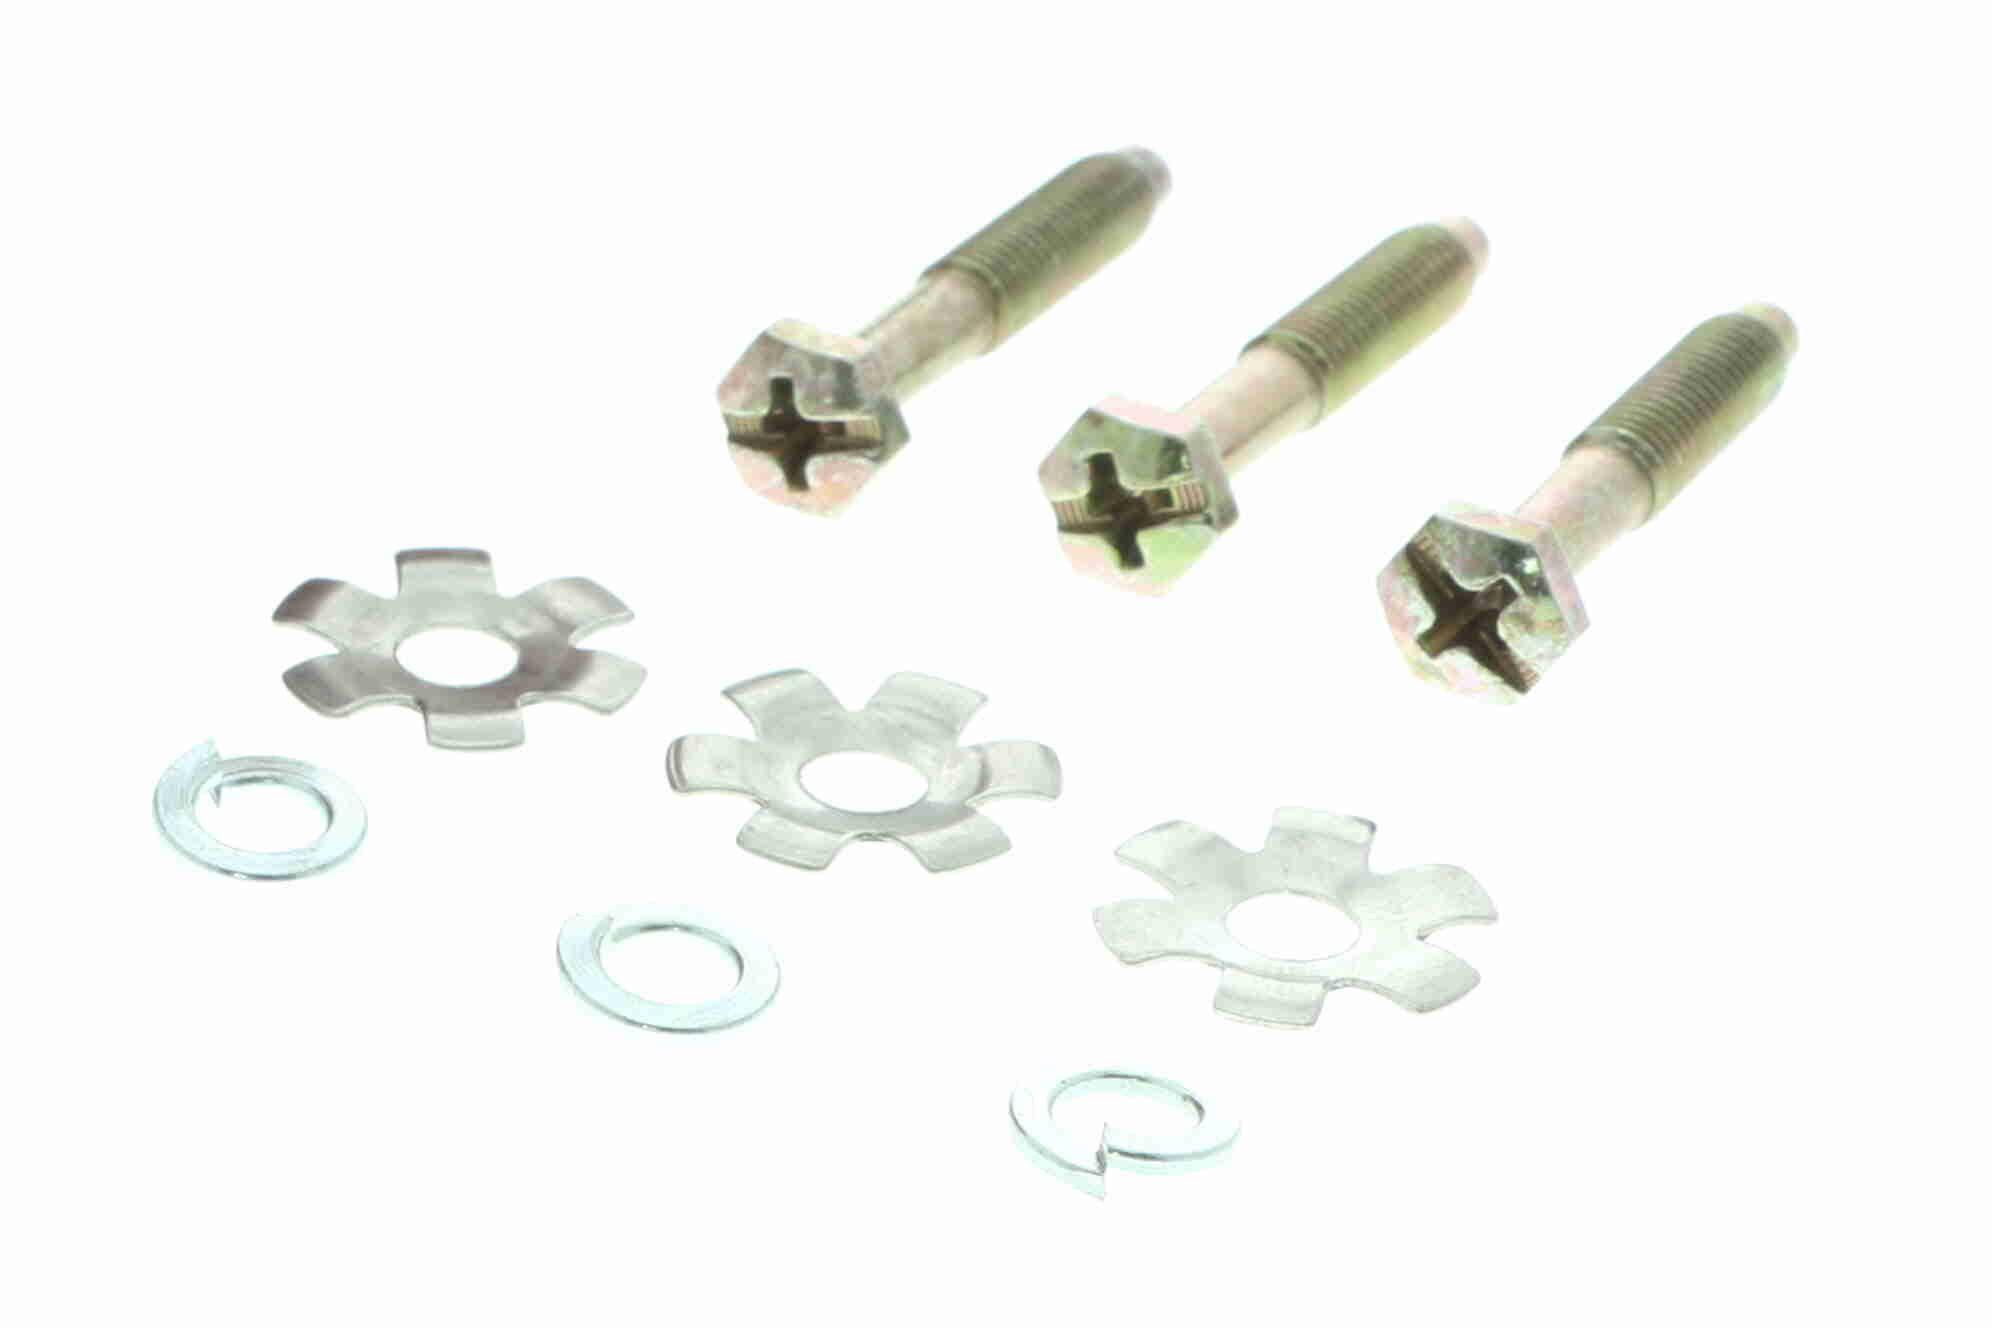 Zündverteilerkappe VEMO V20-70-0009 Bewertung